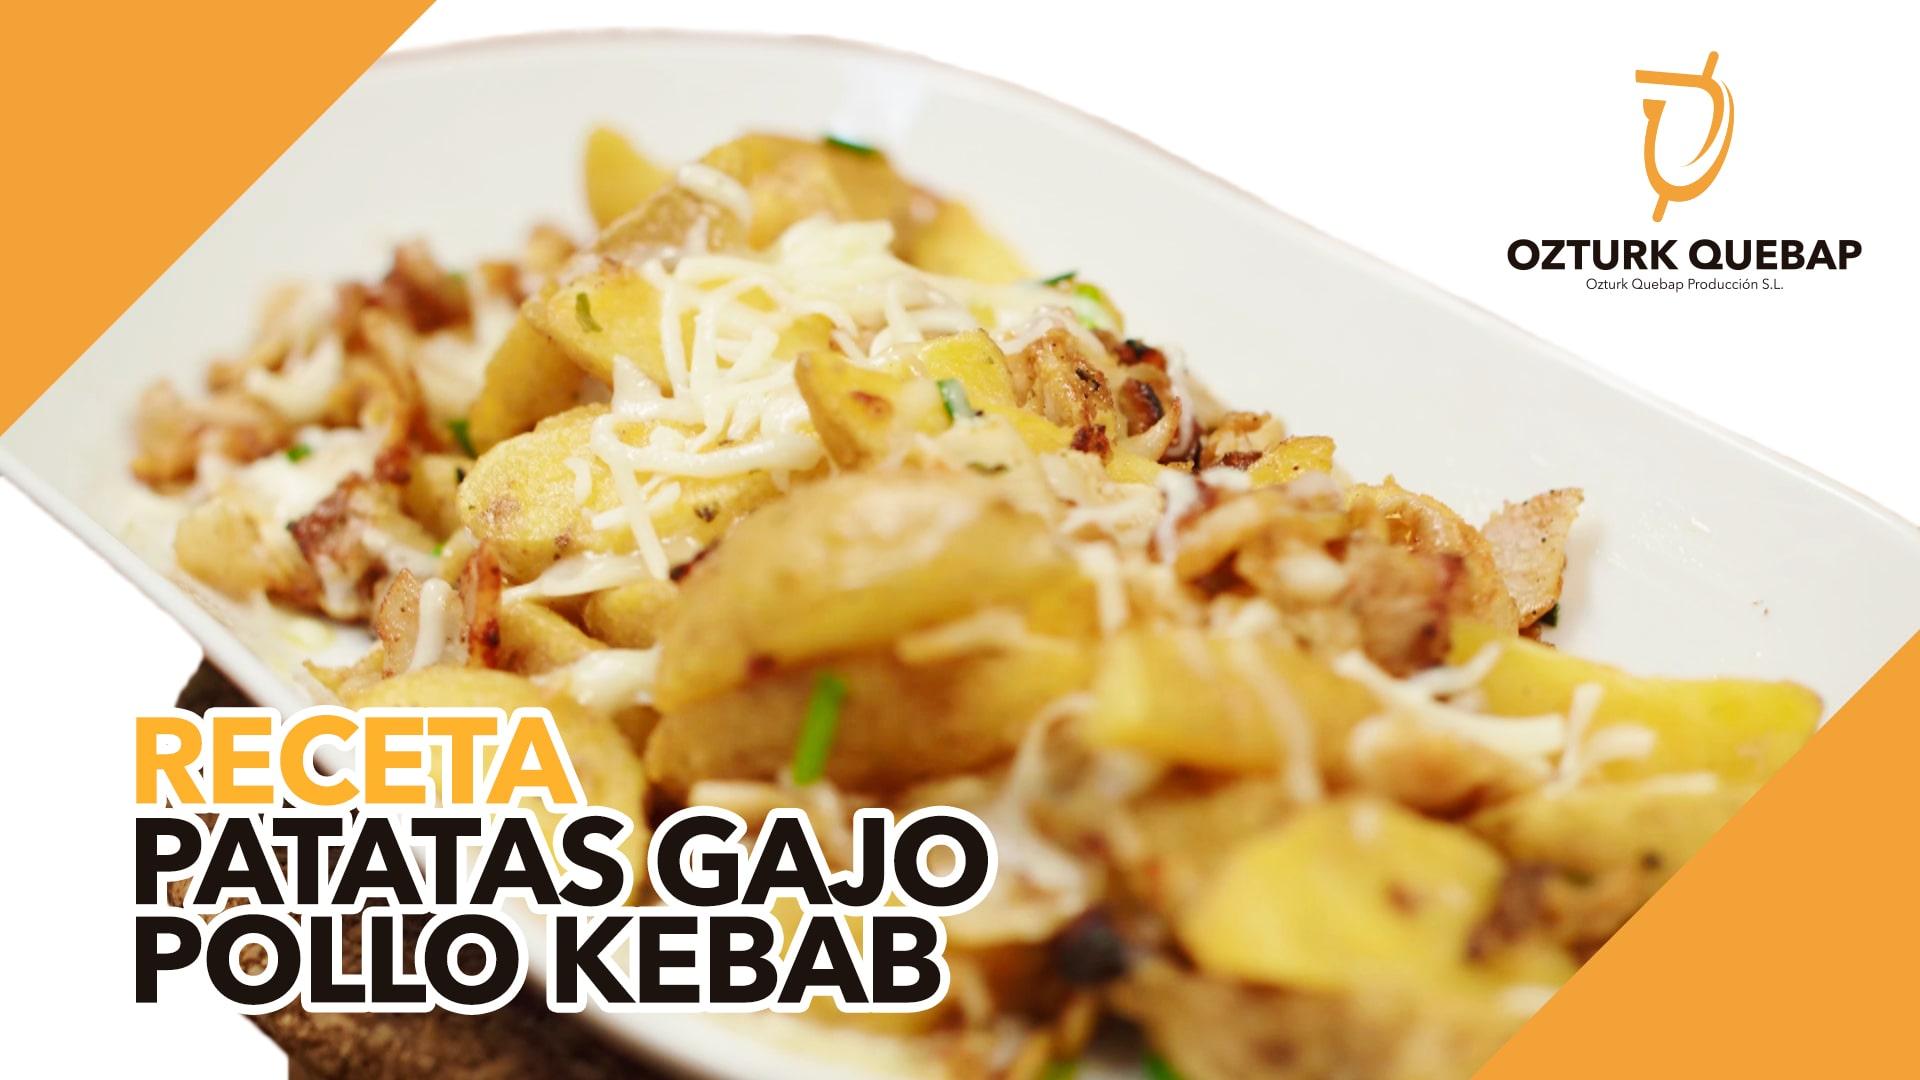 Receta Patatas Gajo con loncheado de pollo Ozturk Quebap